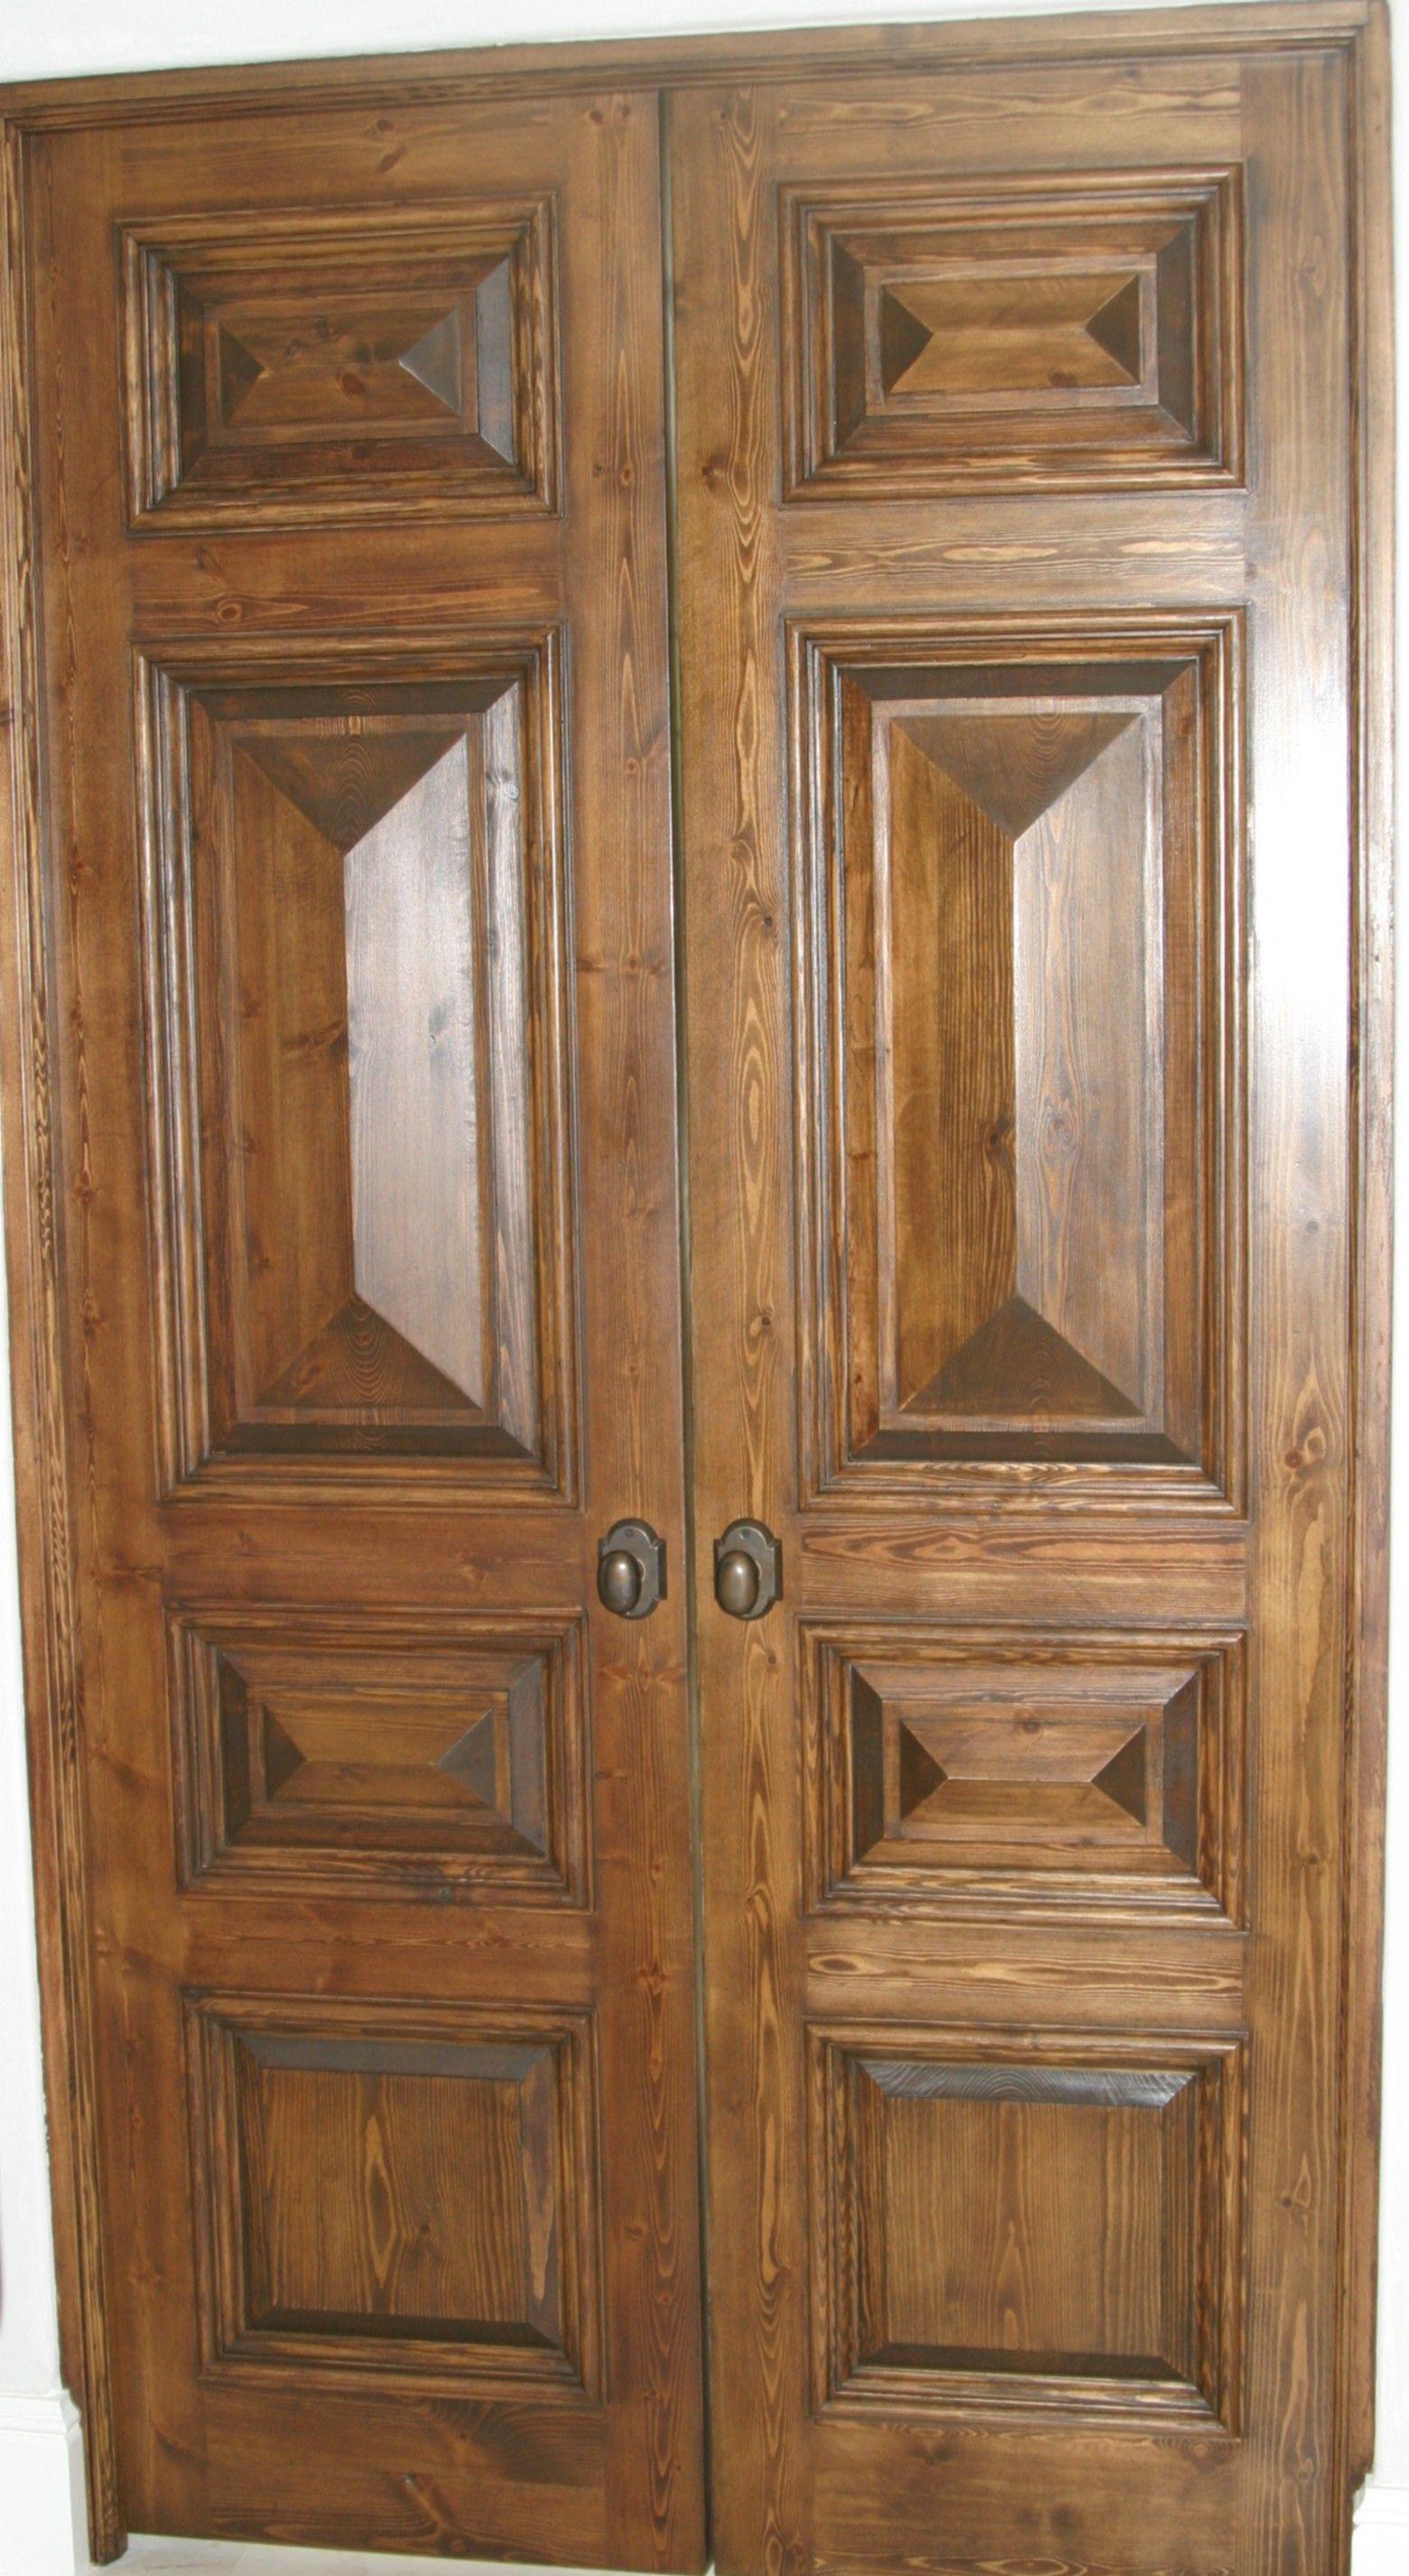 Rustic Pine Interior Double Doors With Pyramid Panels And Bollection Moulding Ev Dekorasyonu Evler Dekorasyon